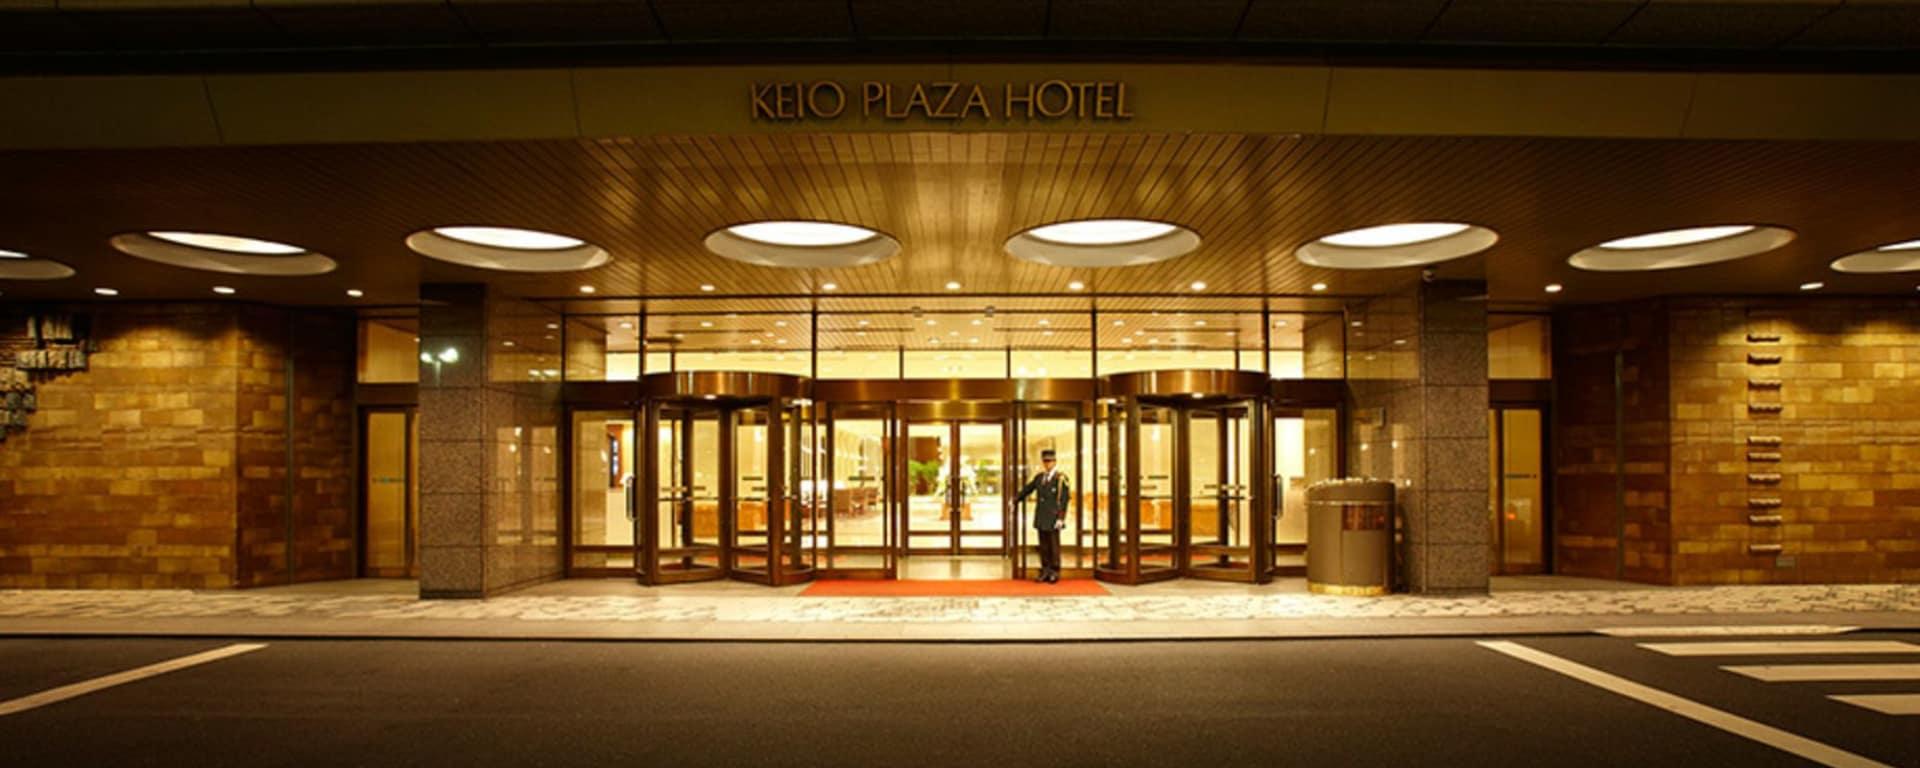 Keio Plaza à Tokyo: Main Entrance